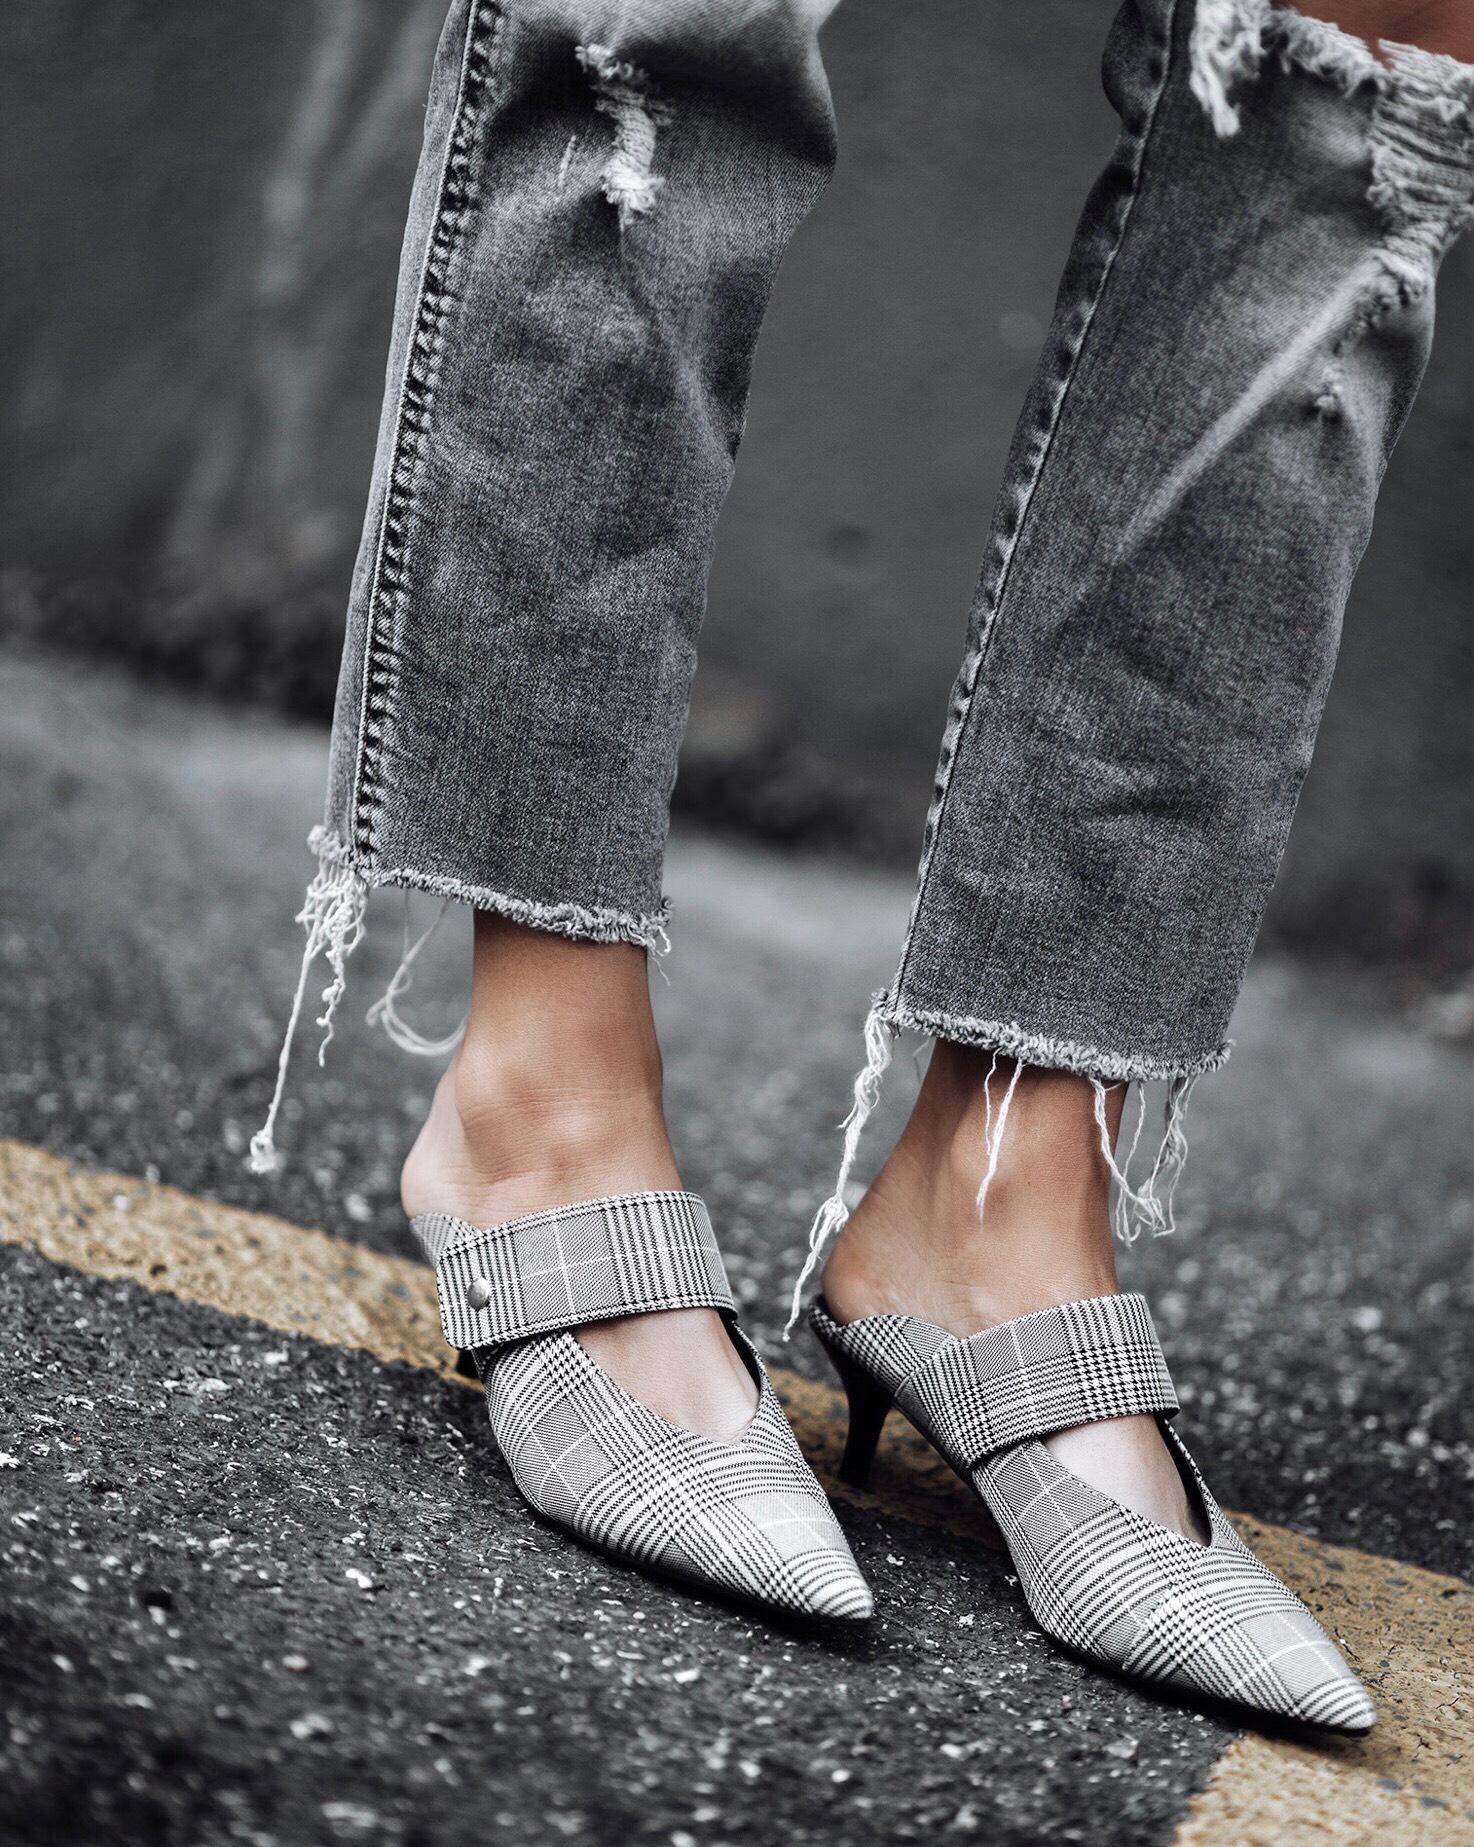 Tiffany Jais fashion and lifestyle blogger of Flaunt and Center | Houston fashion blogger | Friday Feels | Streetstyle blog | #blog #rippeddenim #plaid